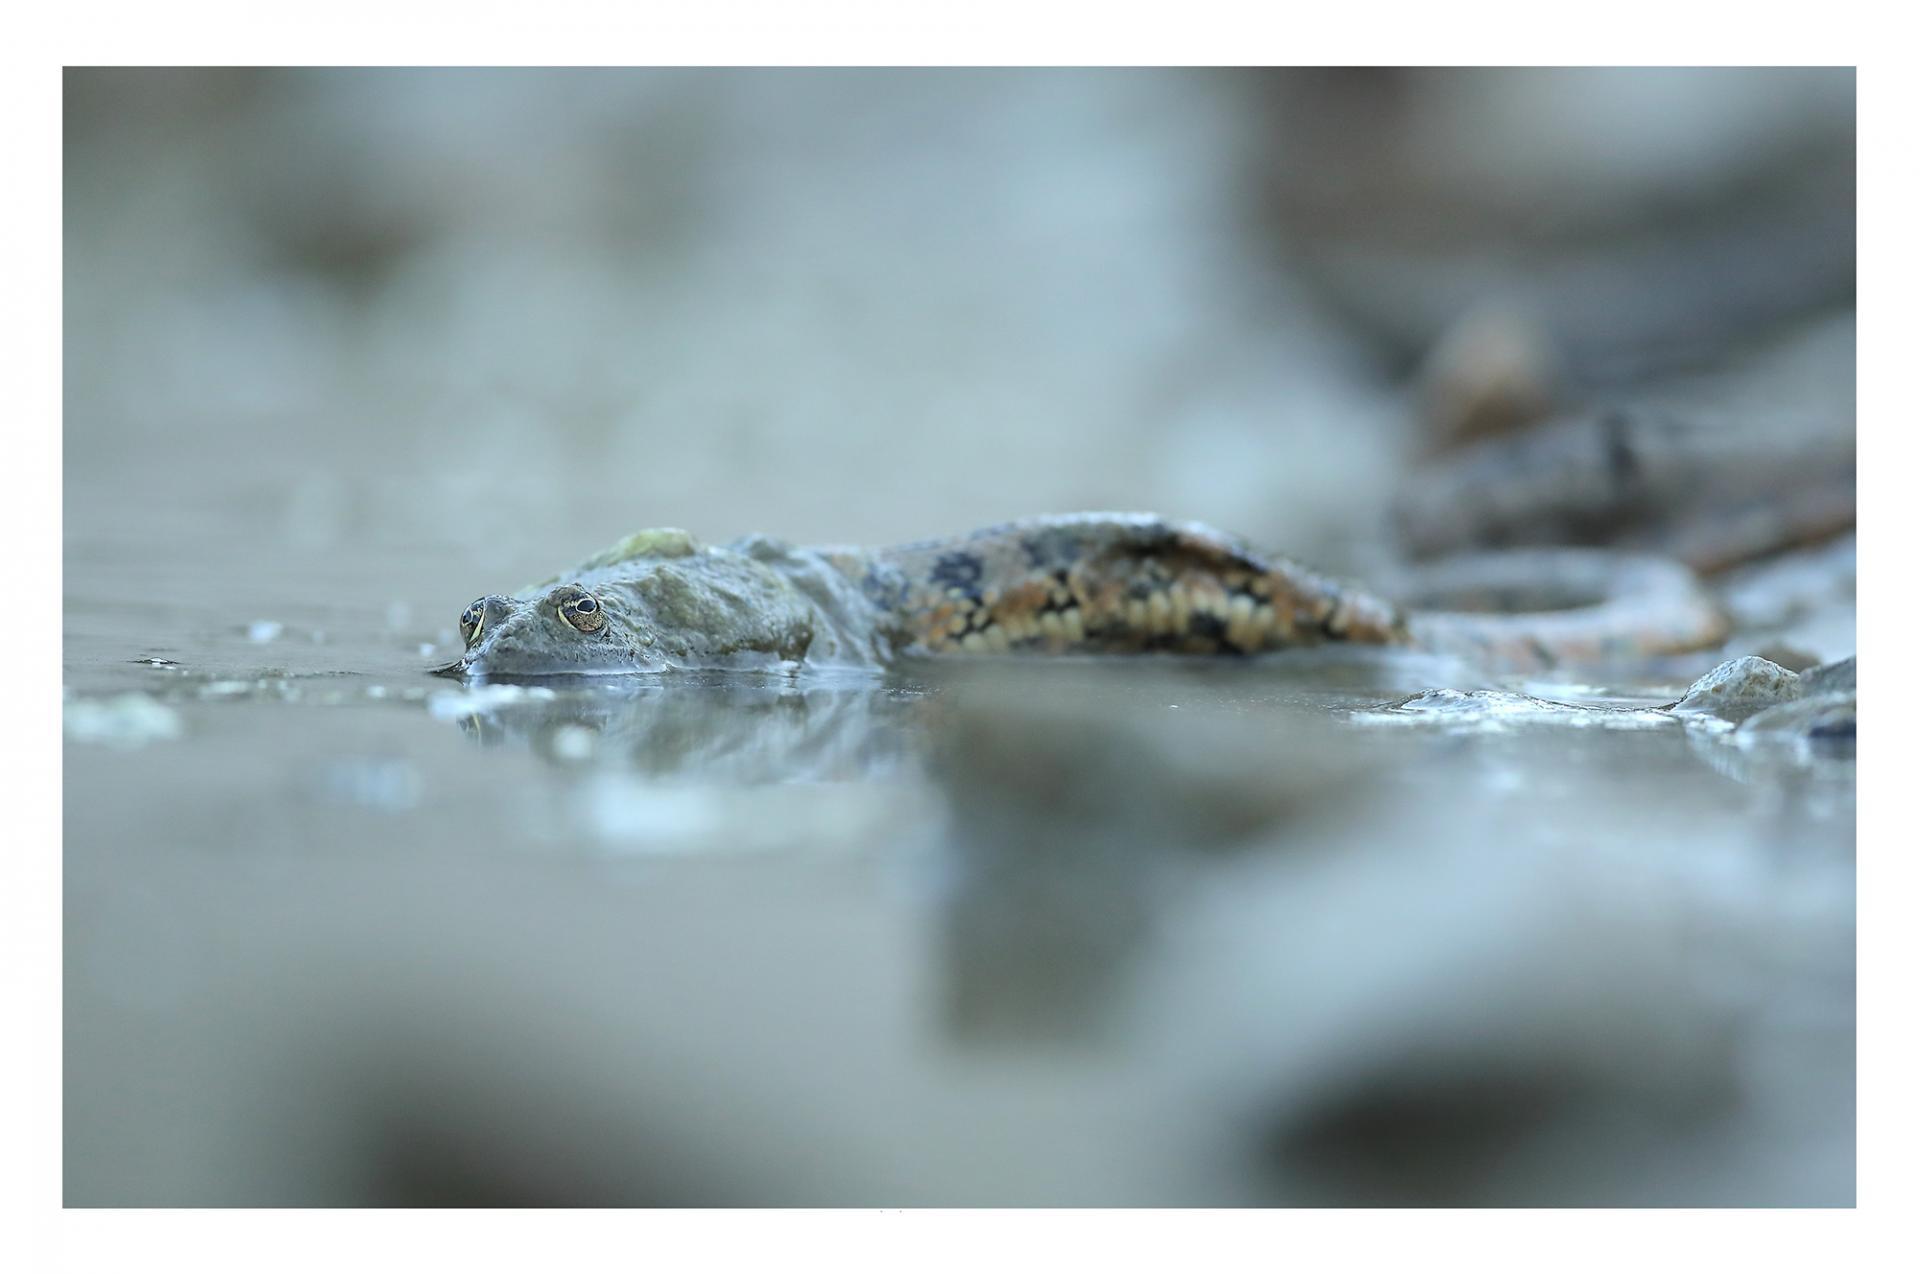 Grenouille vs couleuvre vipérine